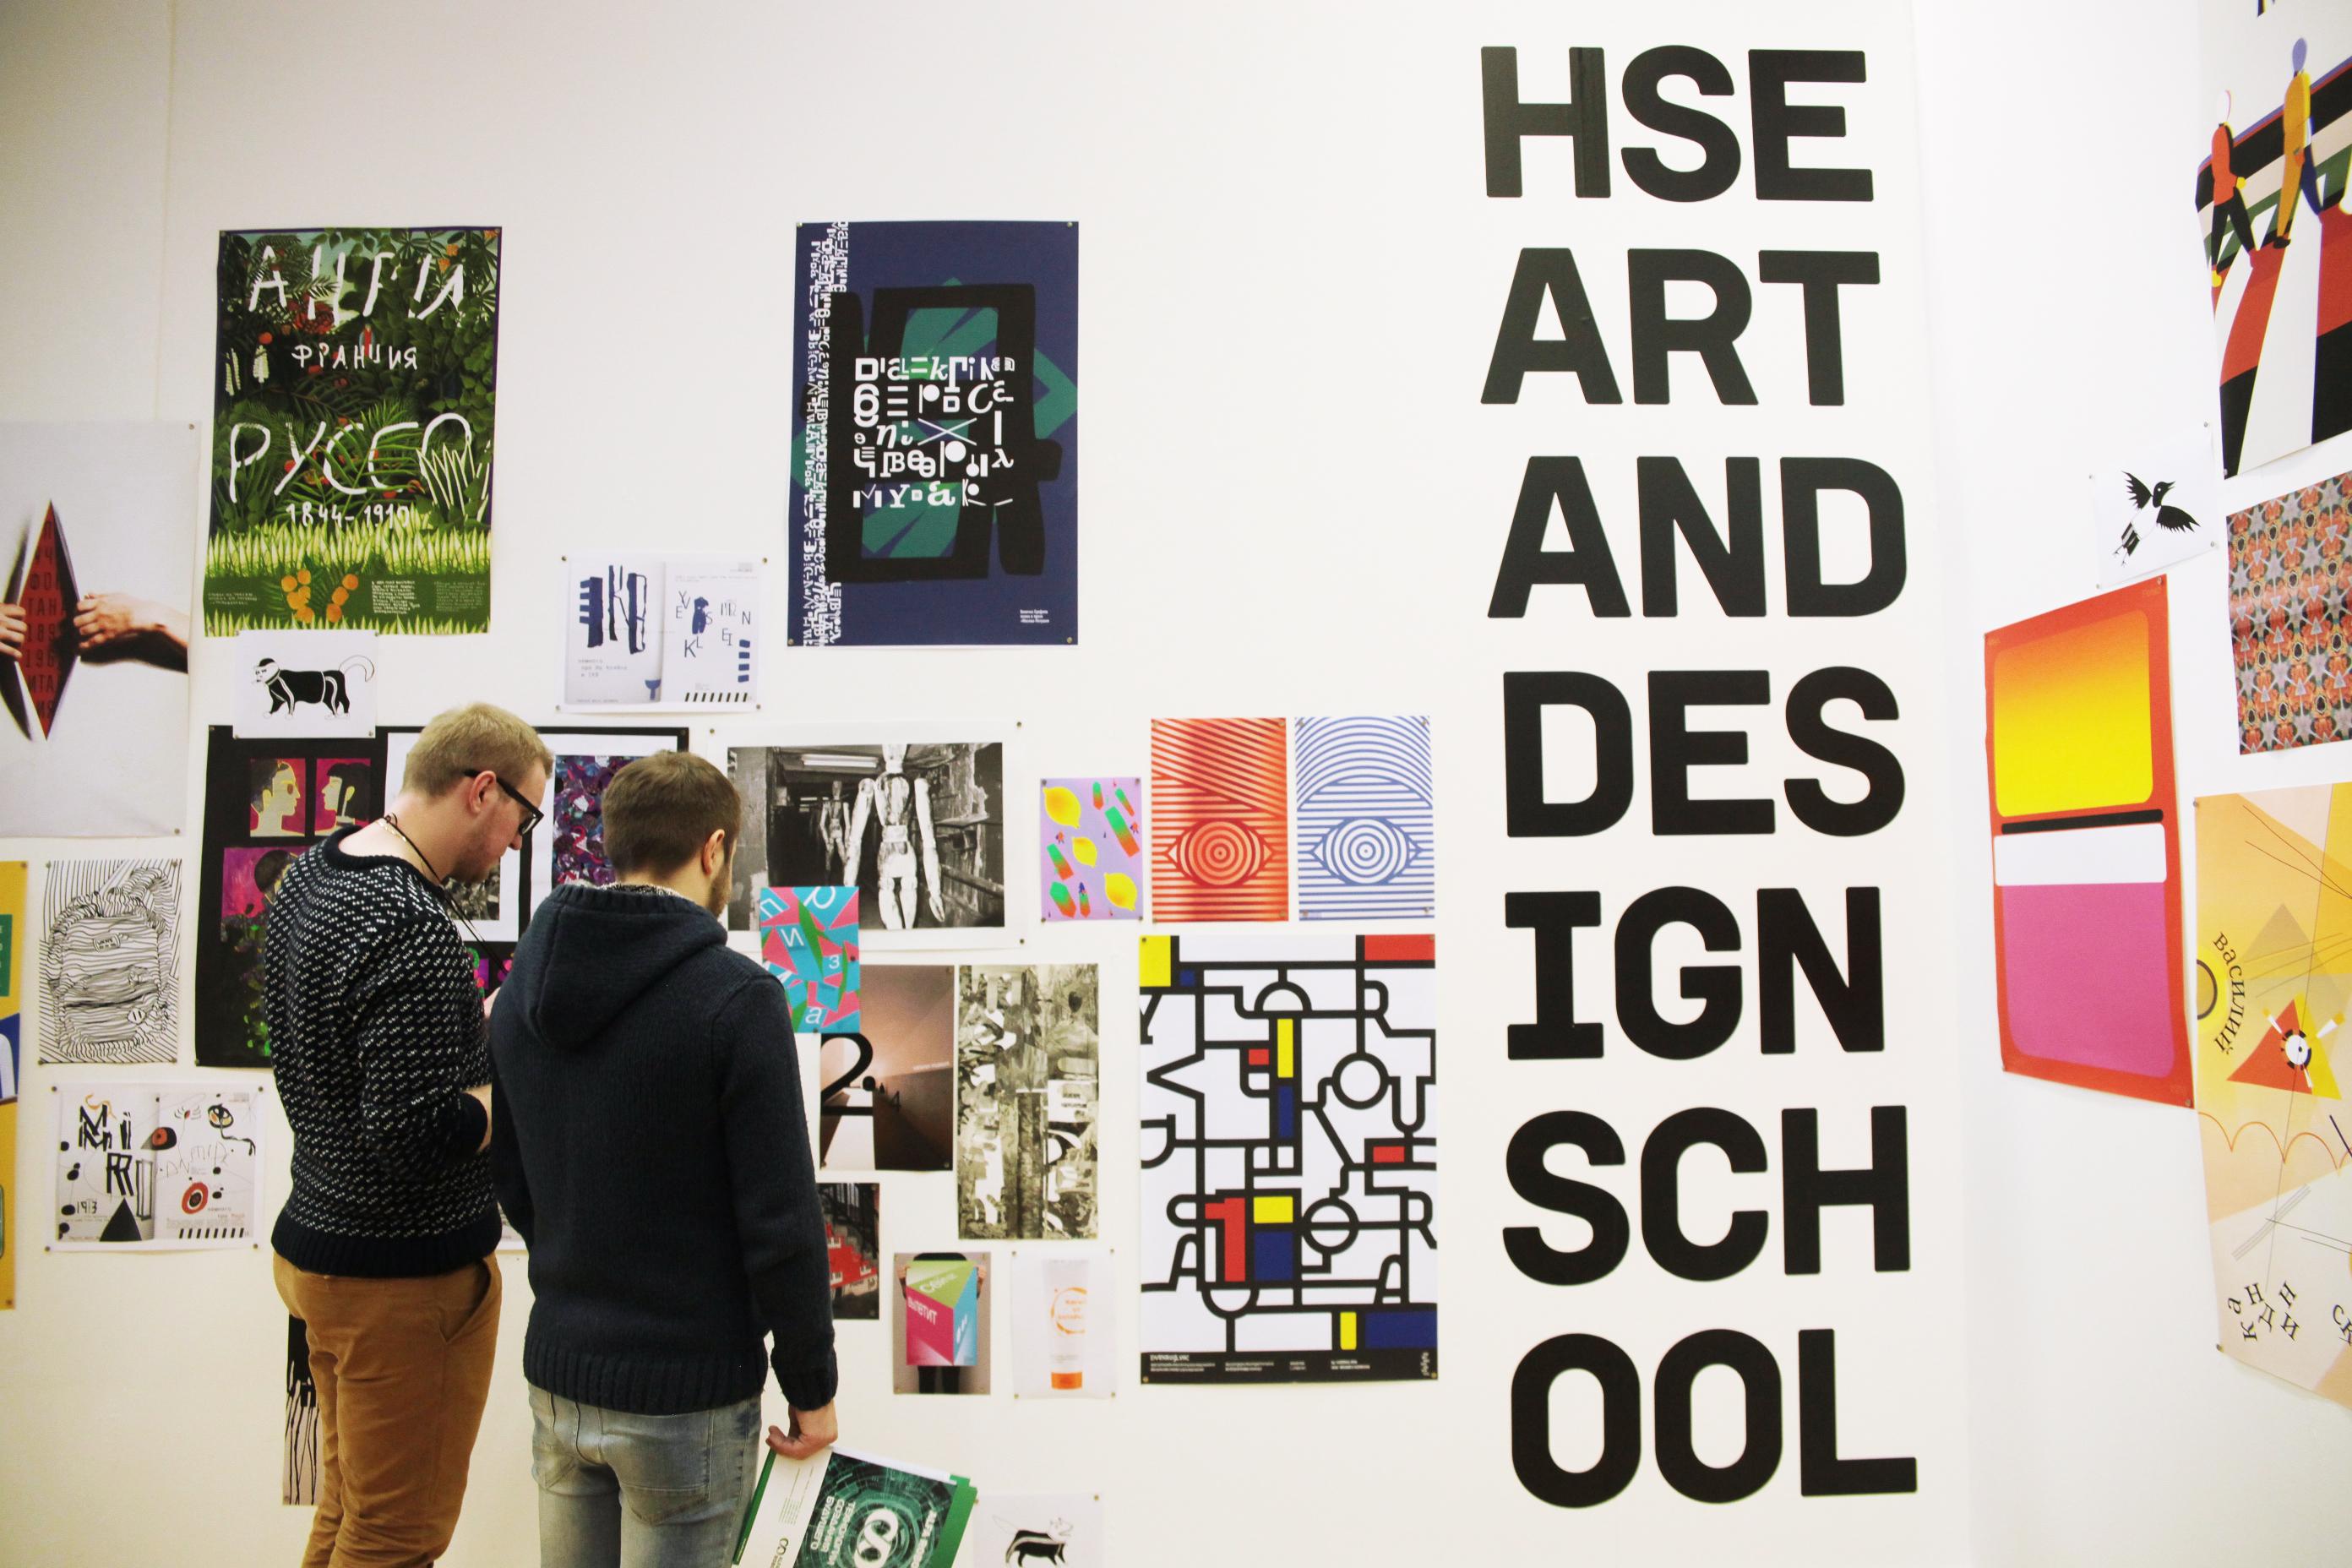 Школа дизайна ниу вшэ